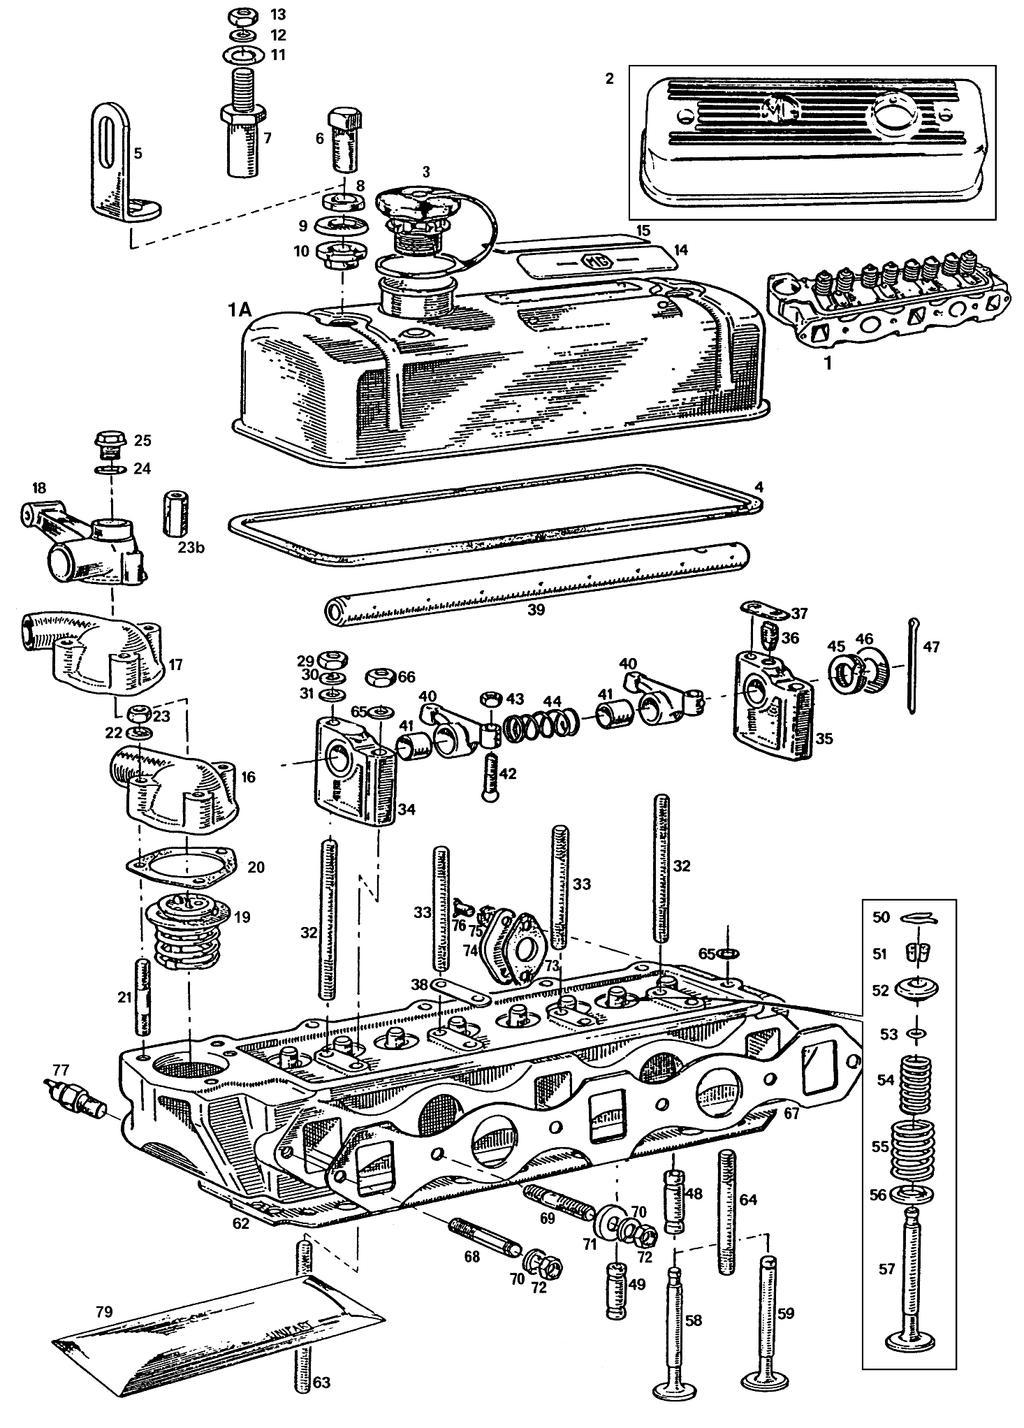 2013 toyota tundra wiring diagram for clocks